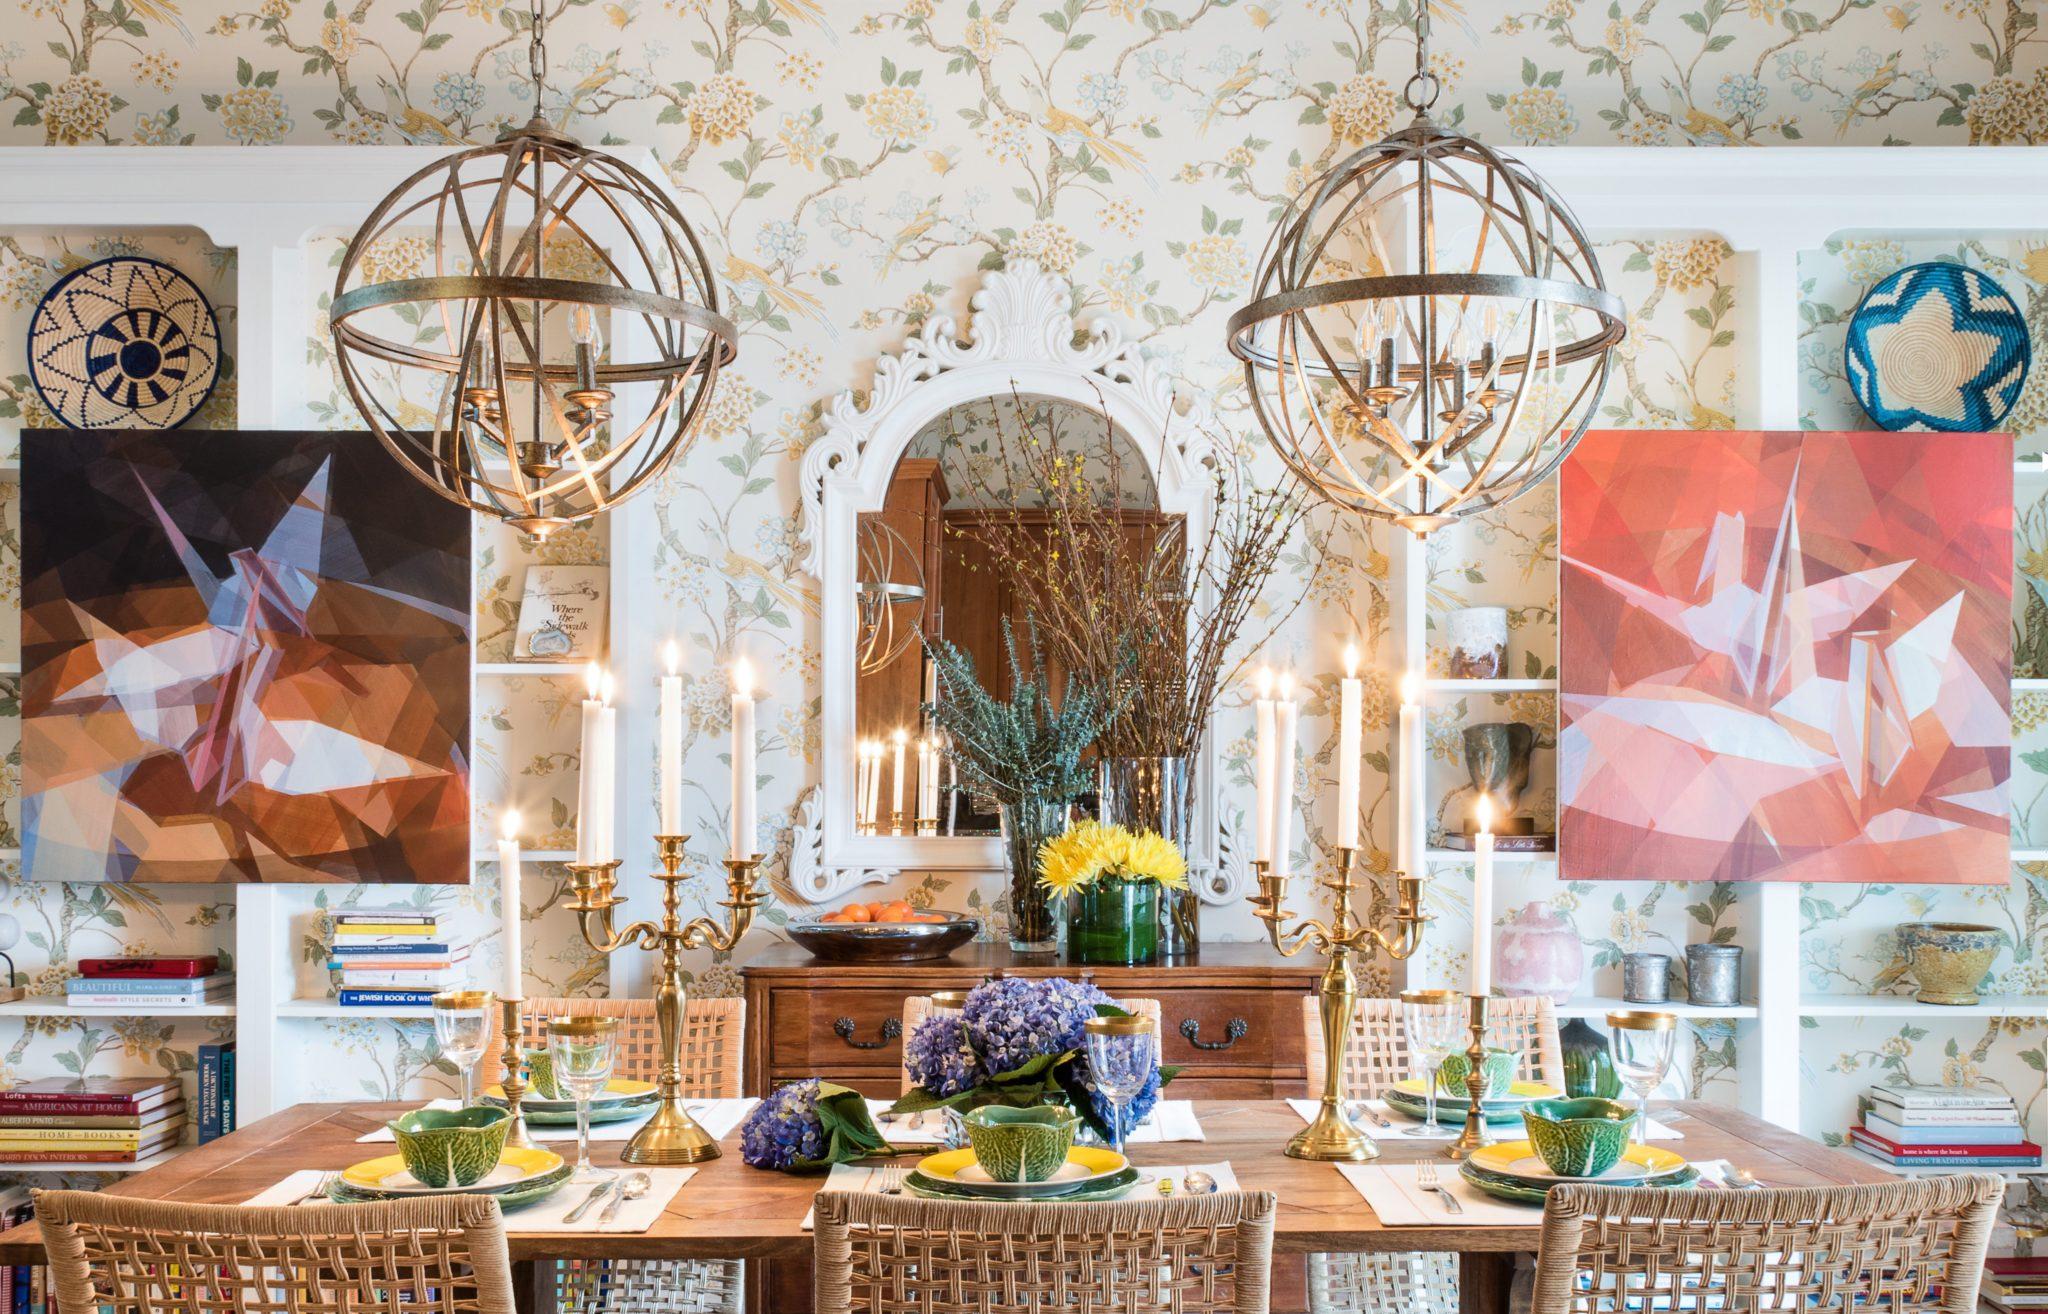 Maximalist dining room colorful floral wallpaper pendant bookcase art candelabra by Dane Austin Design